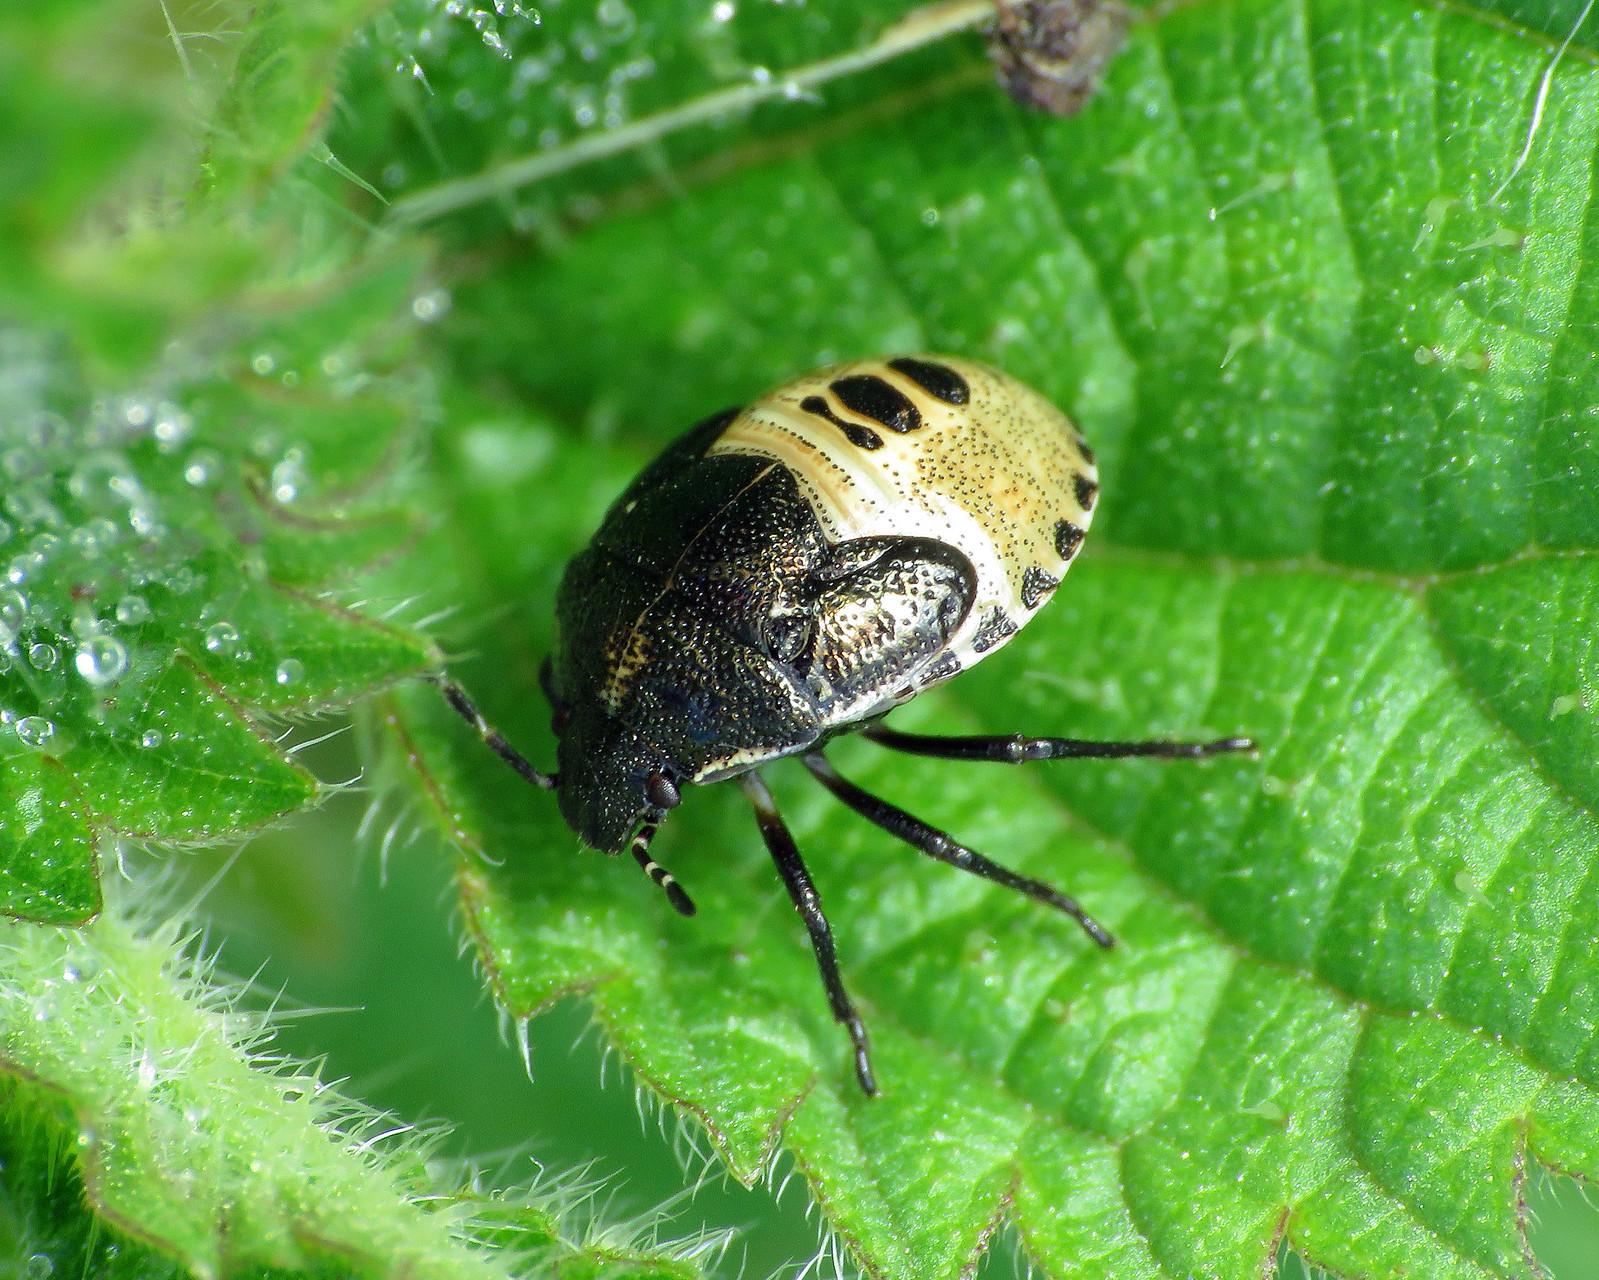 Woundworth Shieldbug - Eysarcoris venustissimus